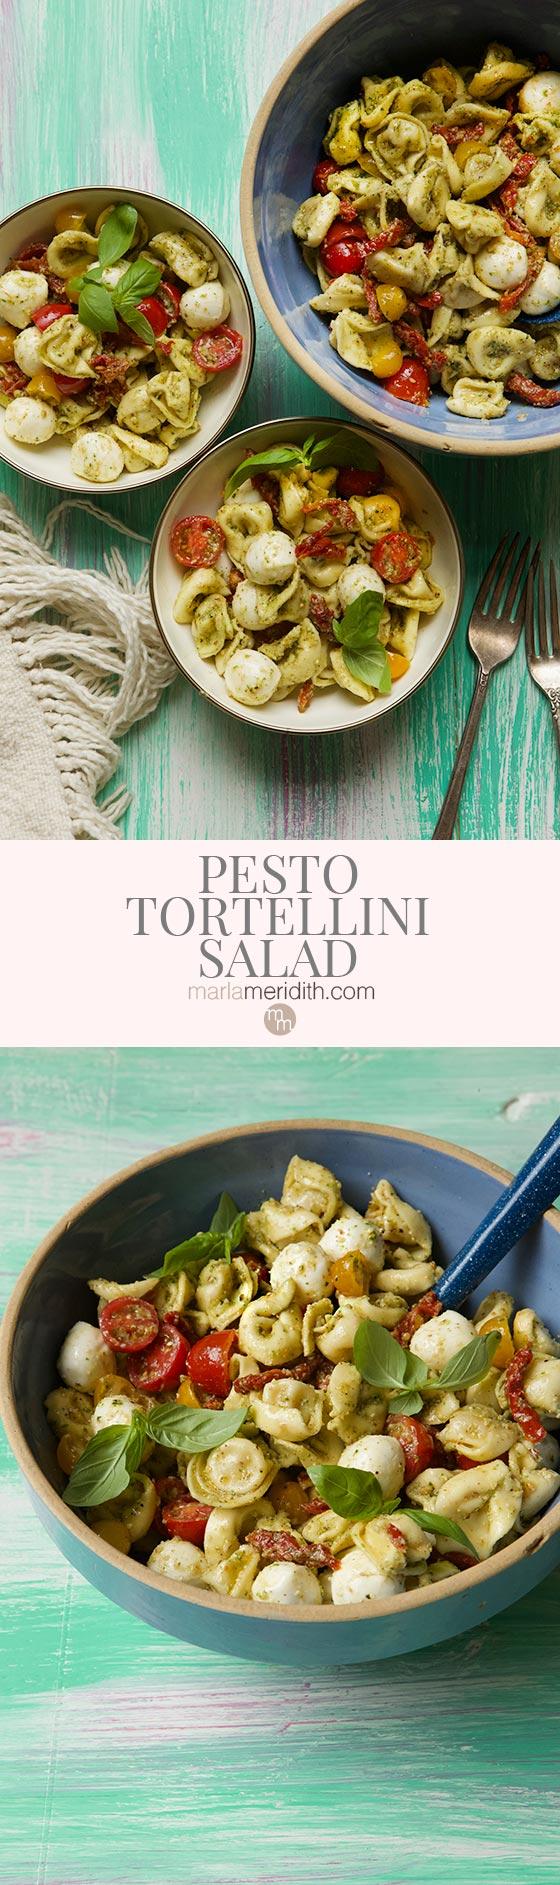 Get the recipe for this delish Pesto Tortellini Salad on MarlaMeridith.com